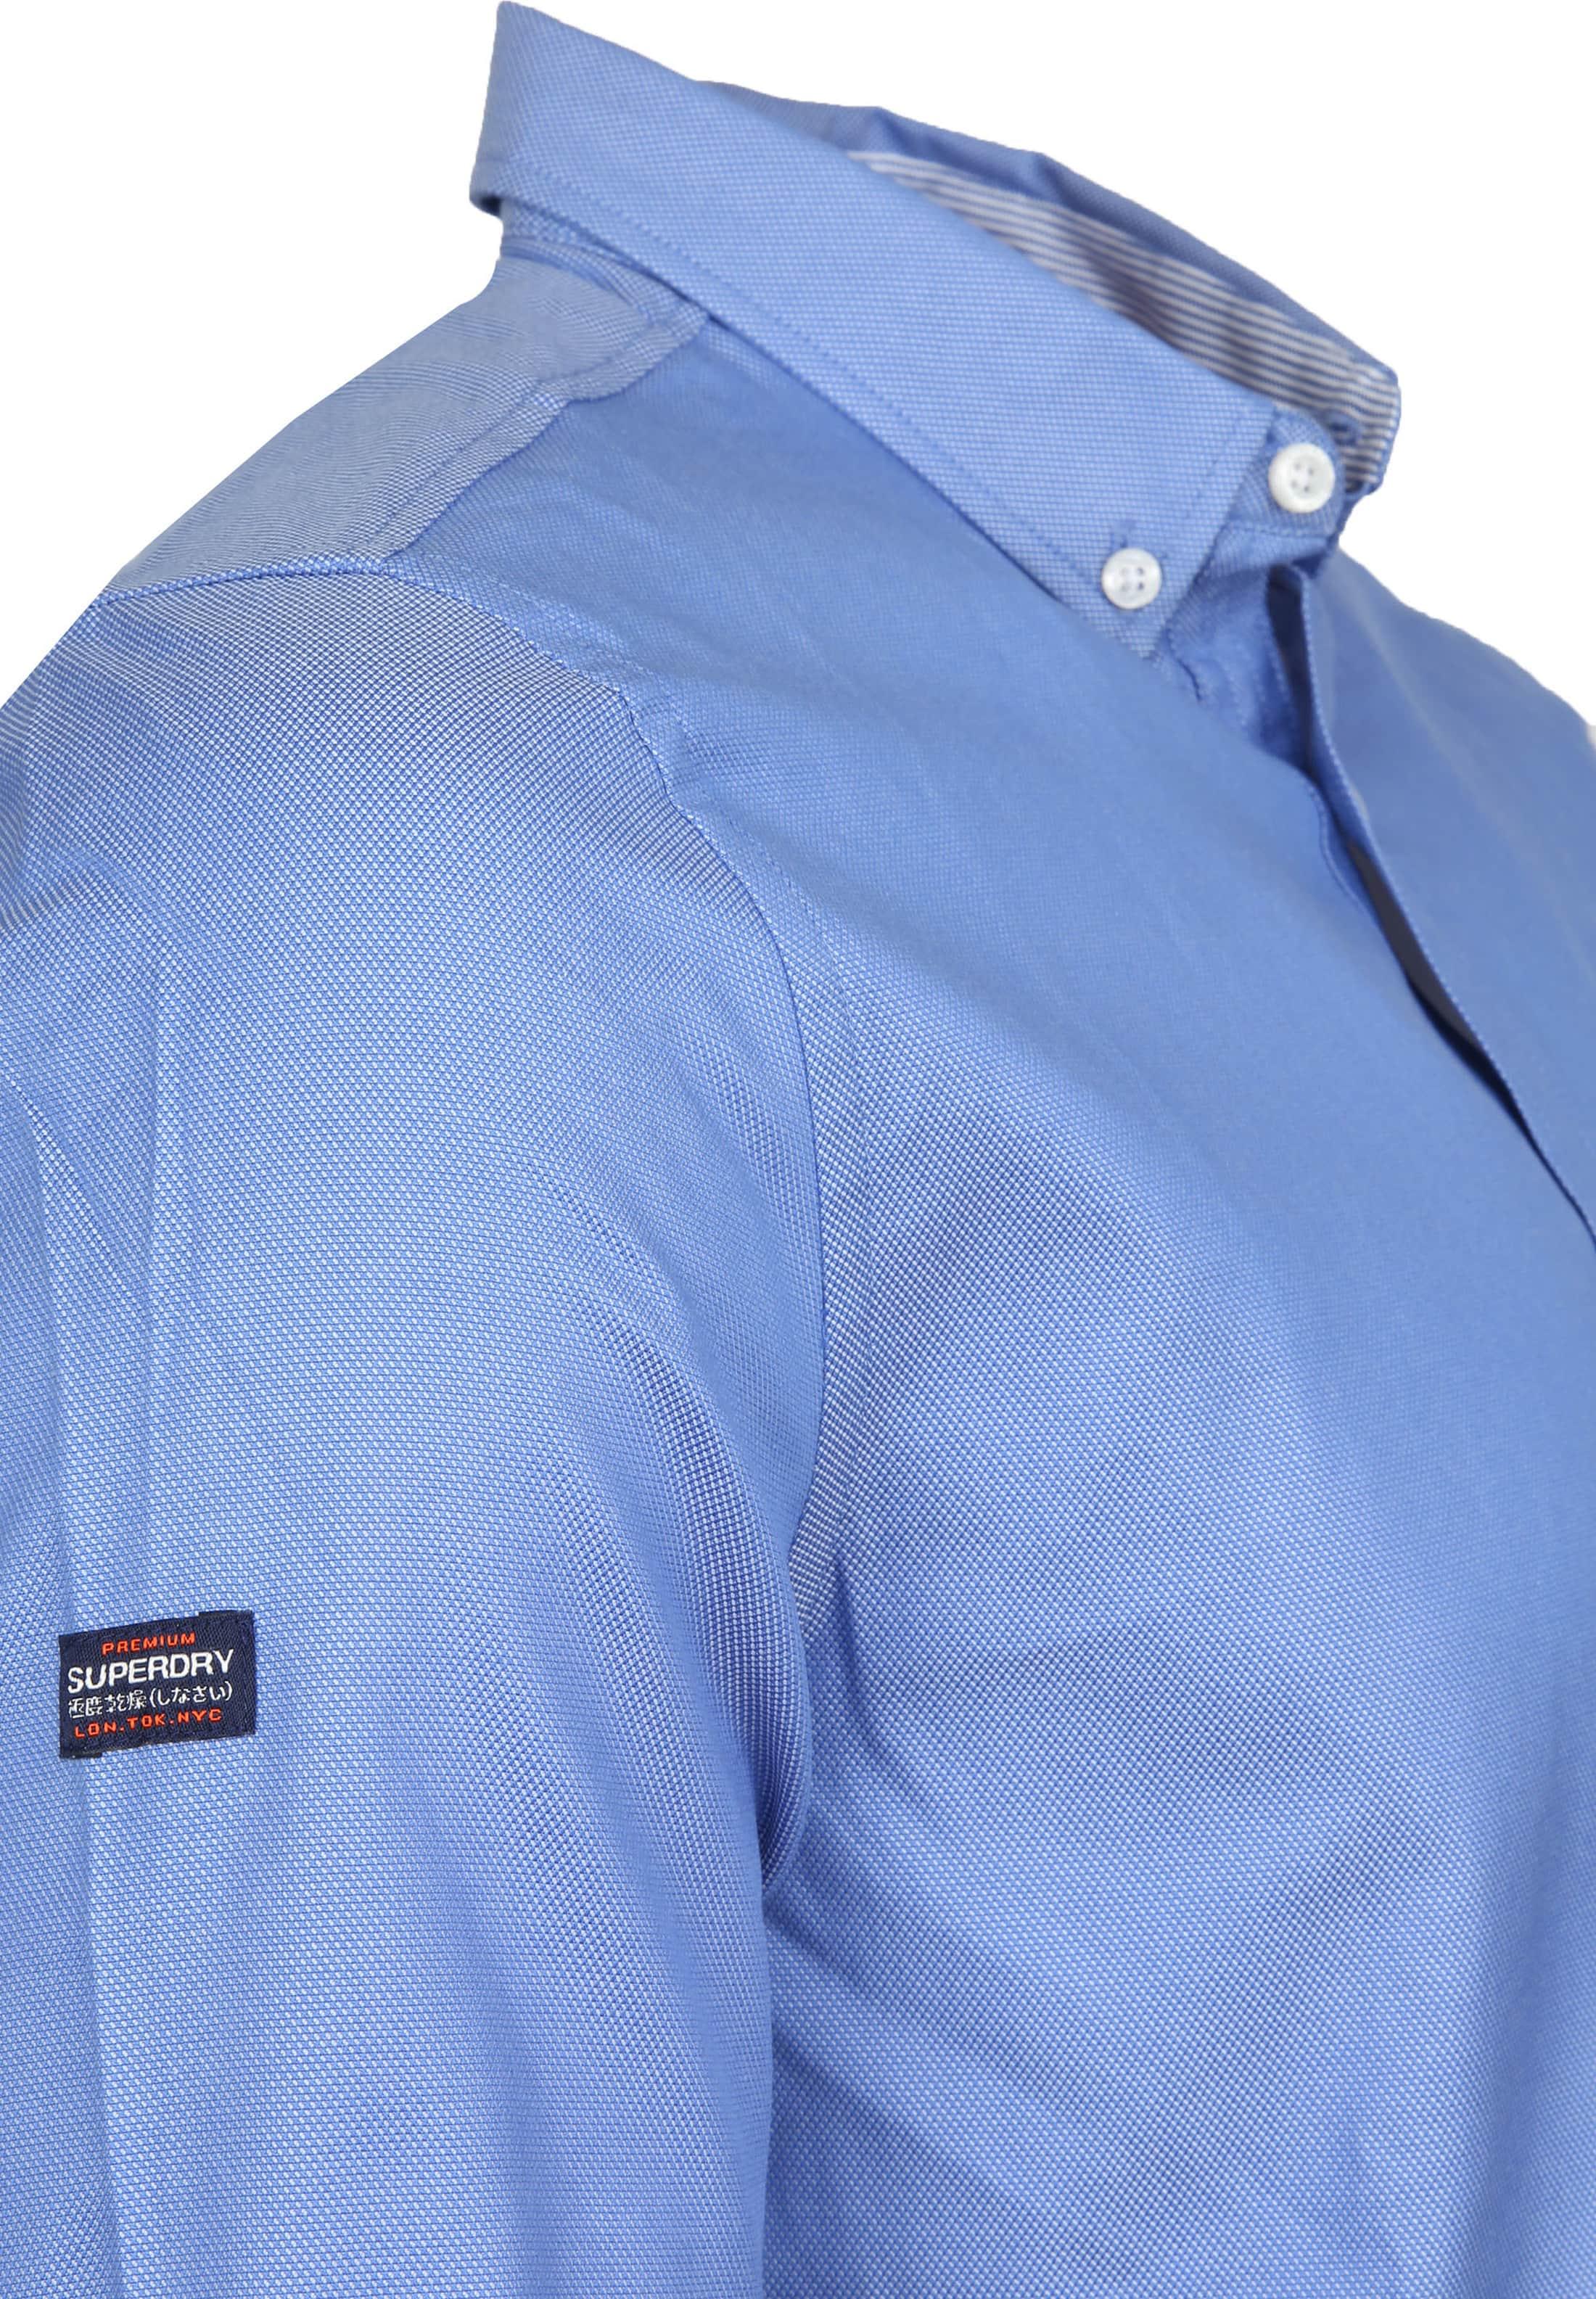 Superdry Overhemd Blauw foto 3